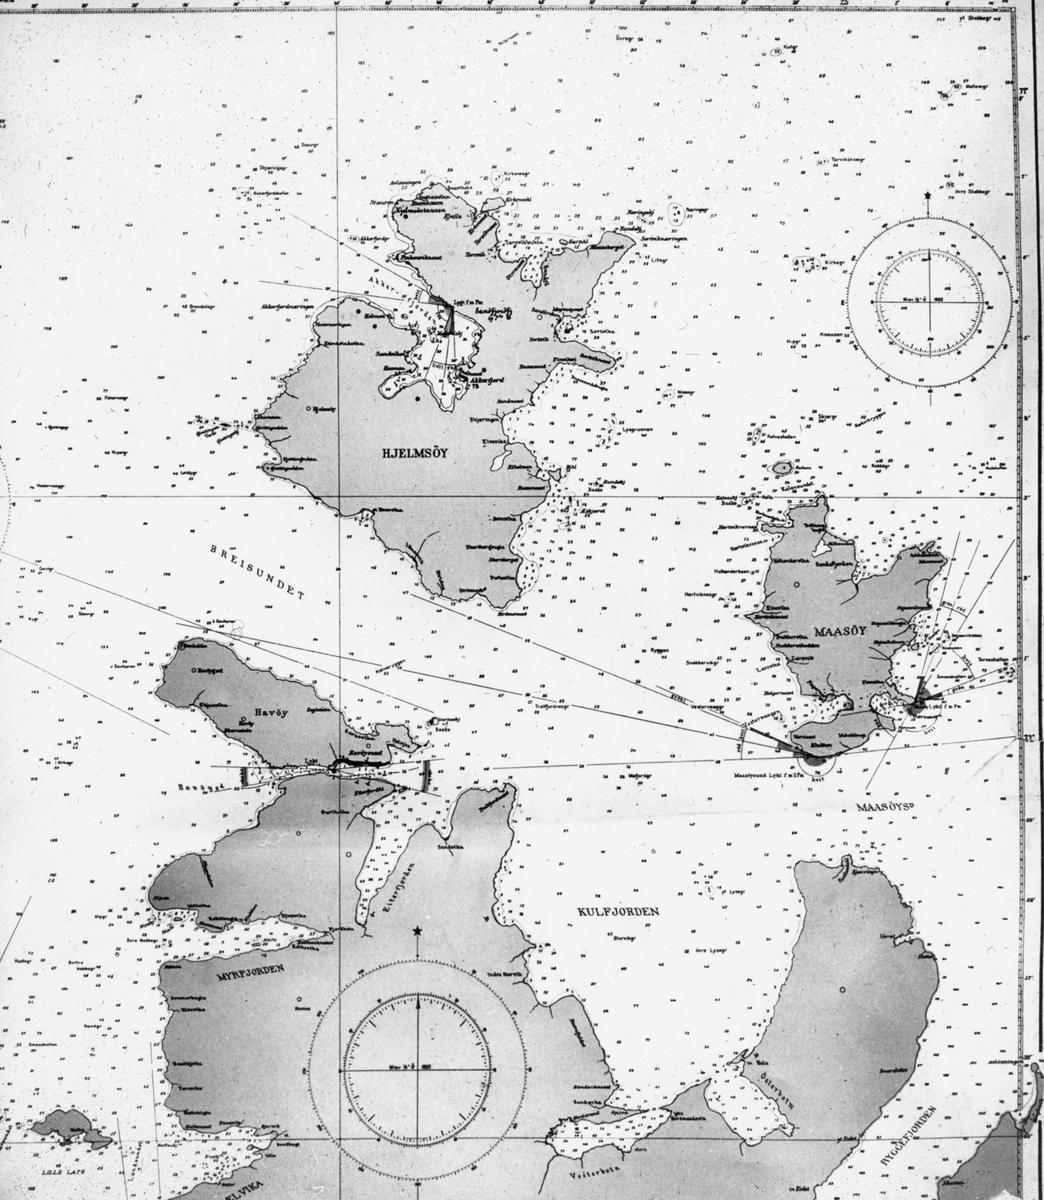 Avfotografert sjøkart